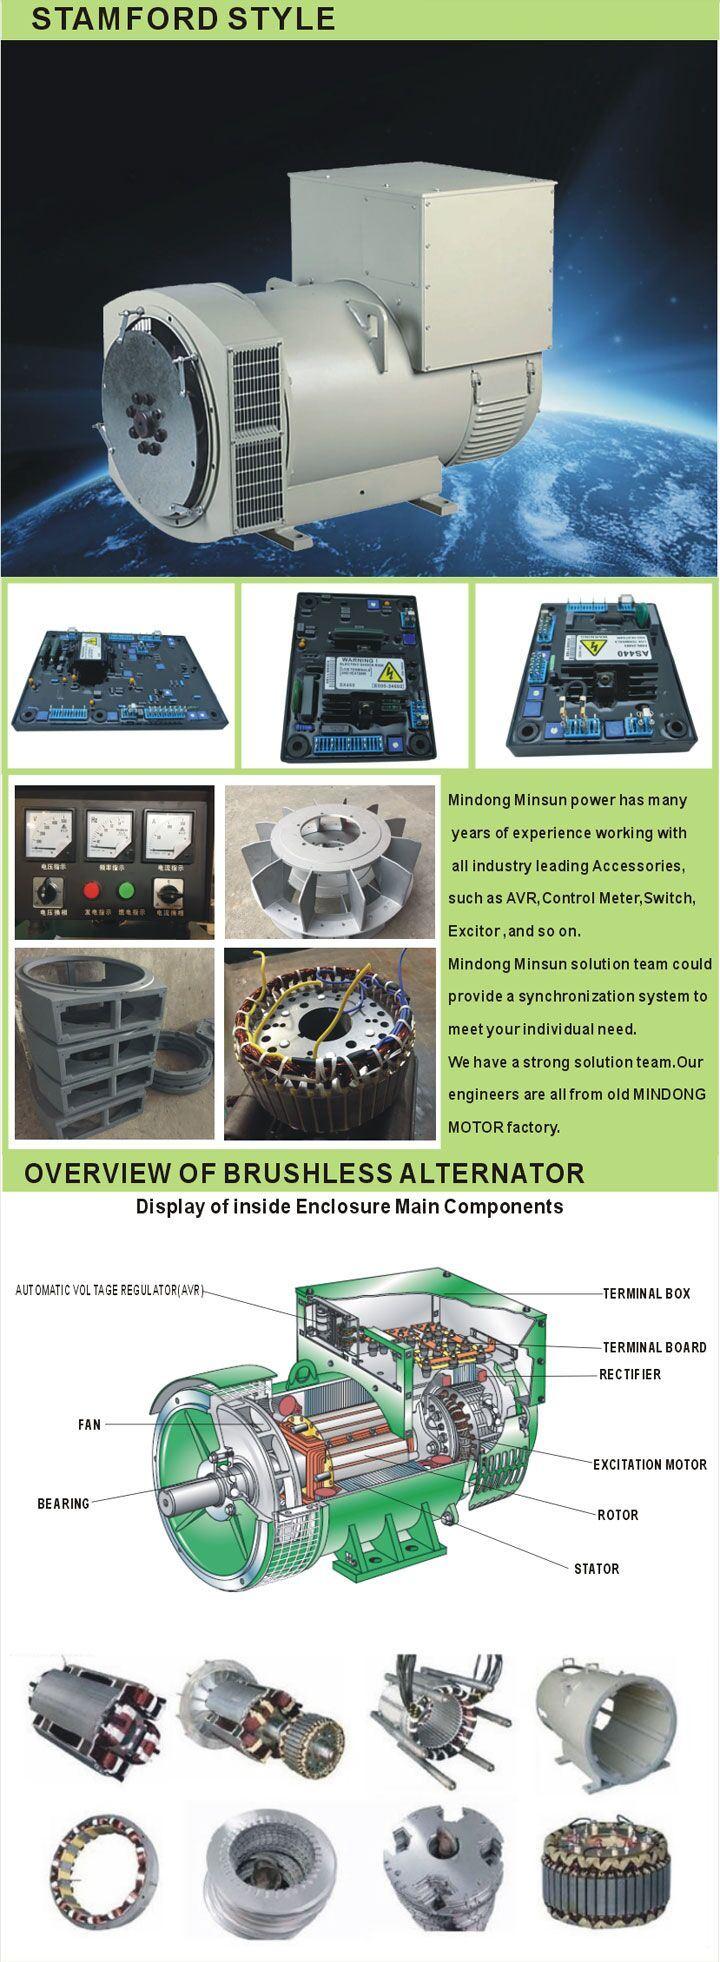 Single Phase Hot Sale Dynamo a. C. Sychronous Brushless Alternator Copy Stamford 85 kVA